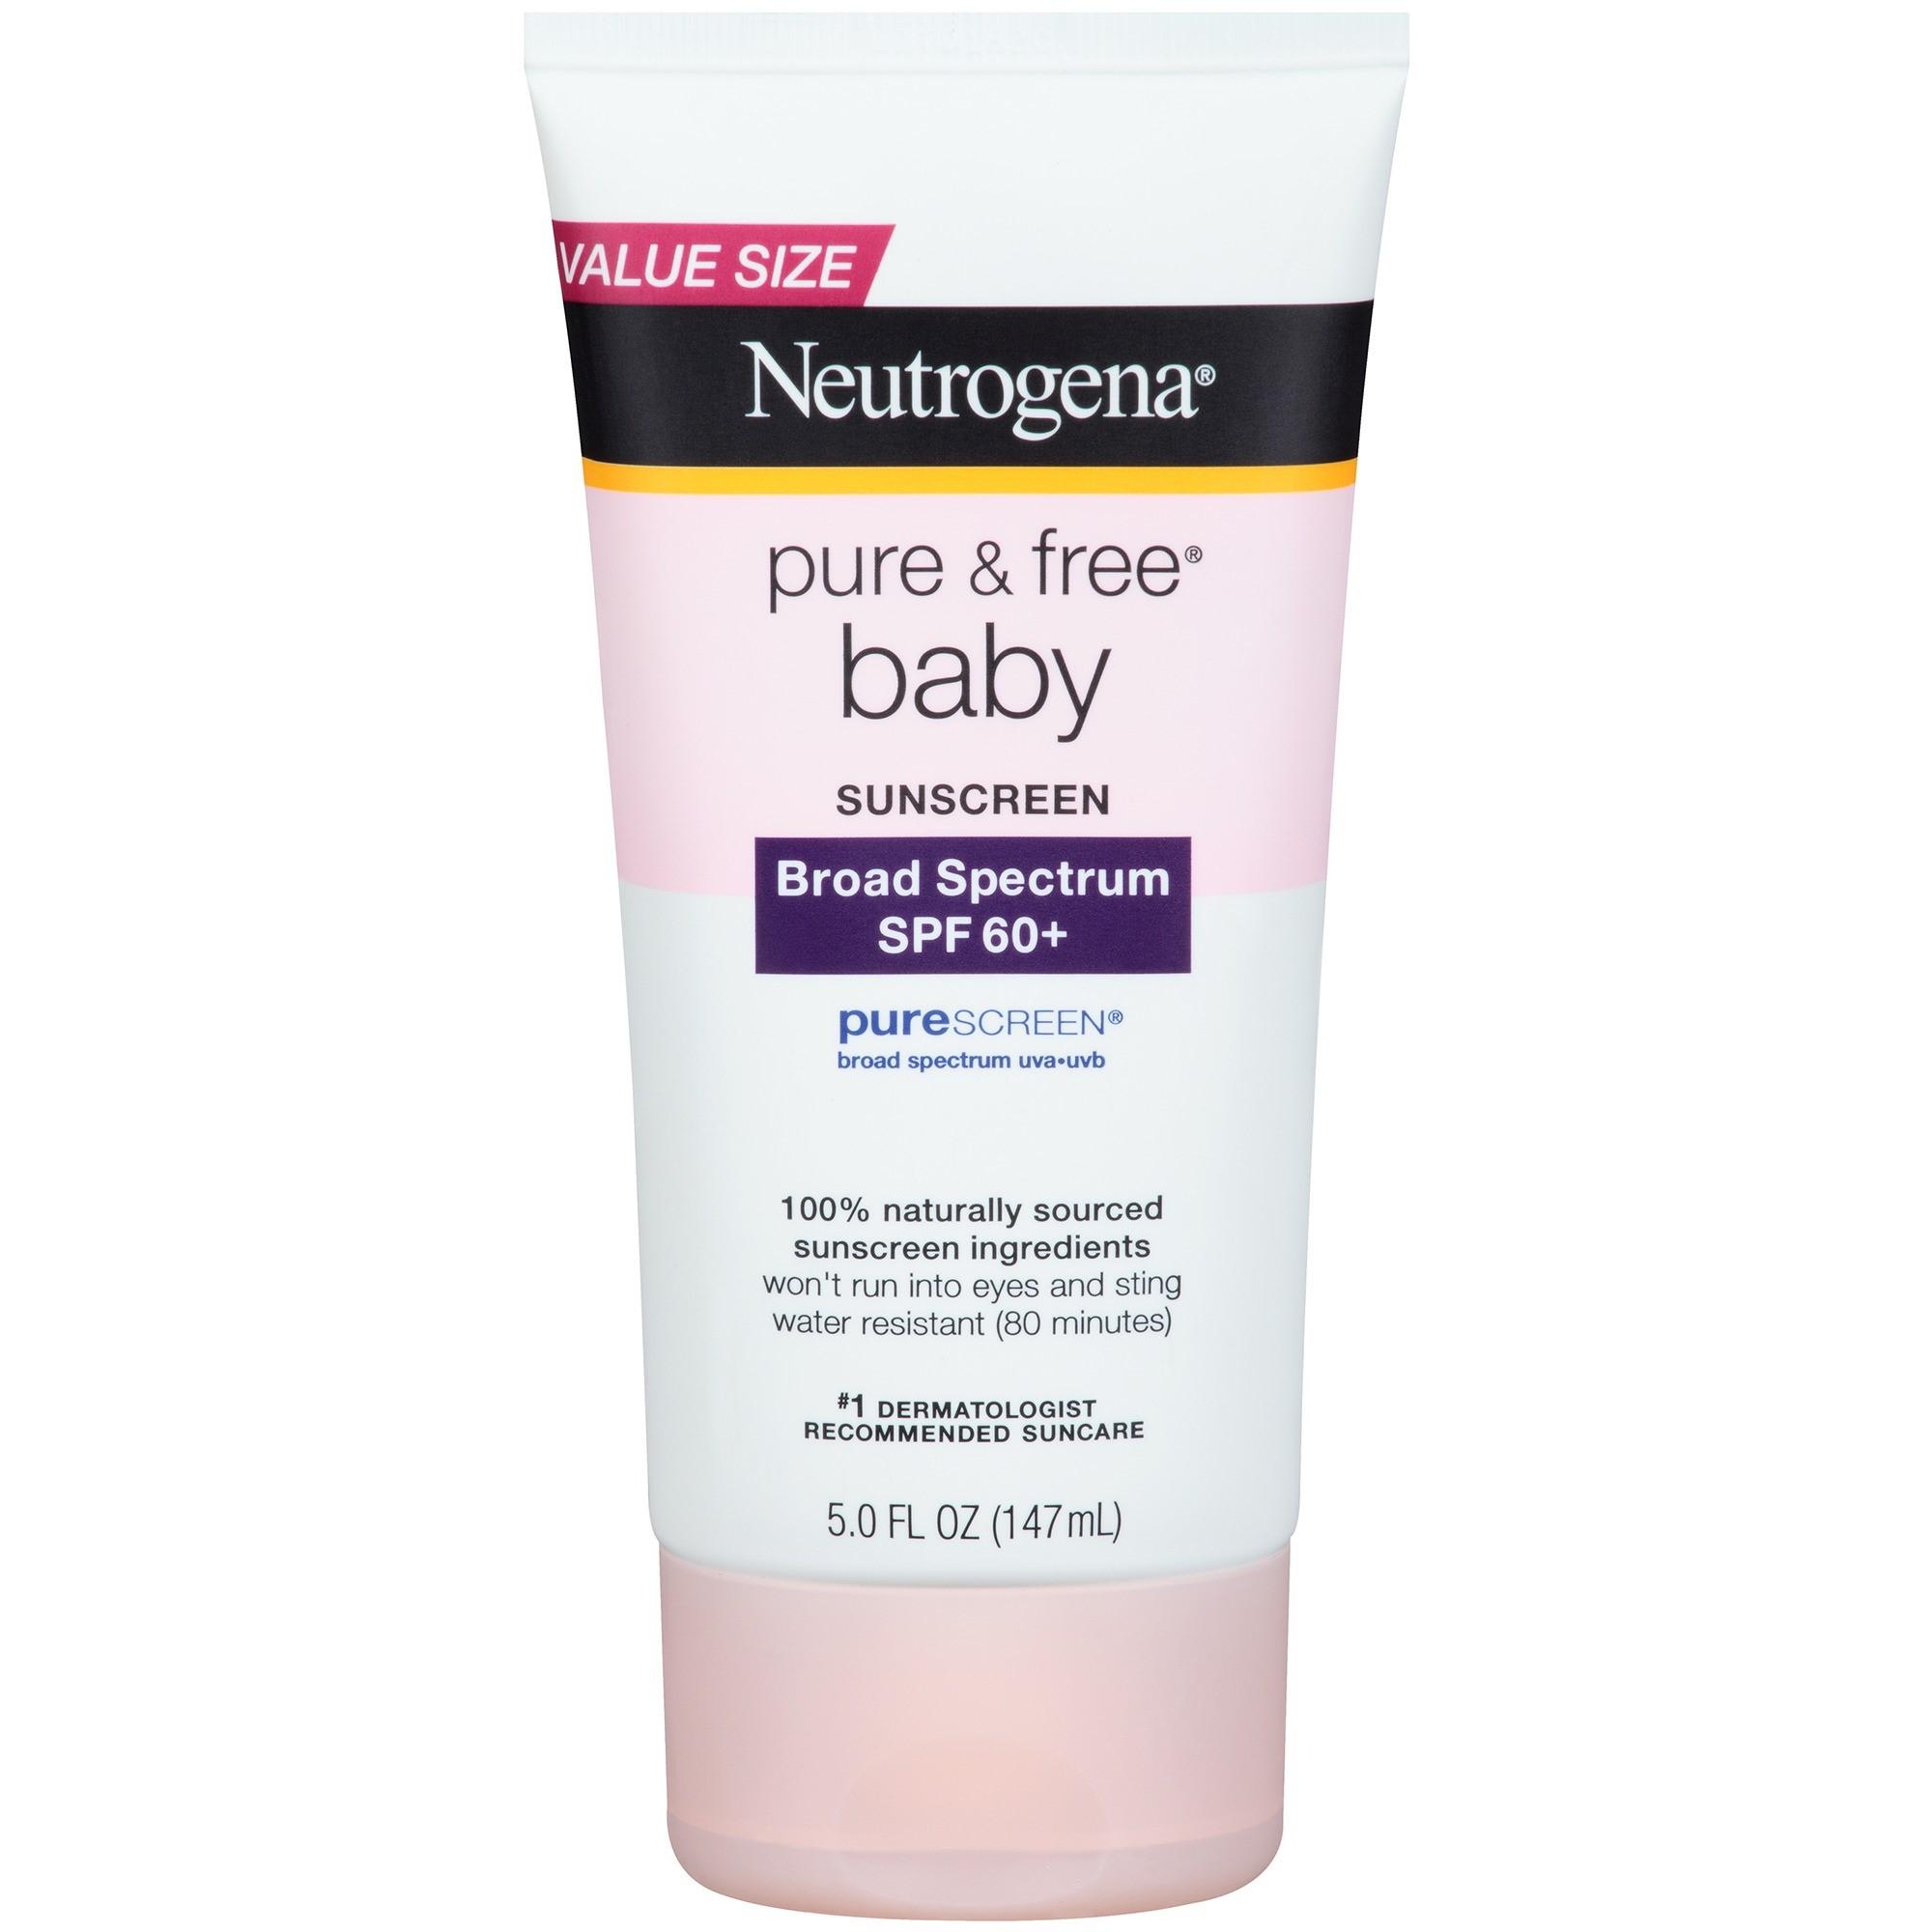 Neutrogena Pure & Free Baby Sunscreen SPF 60, 5 Fl Oz